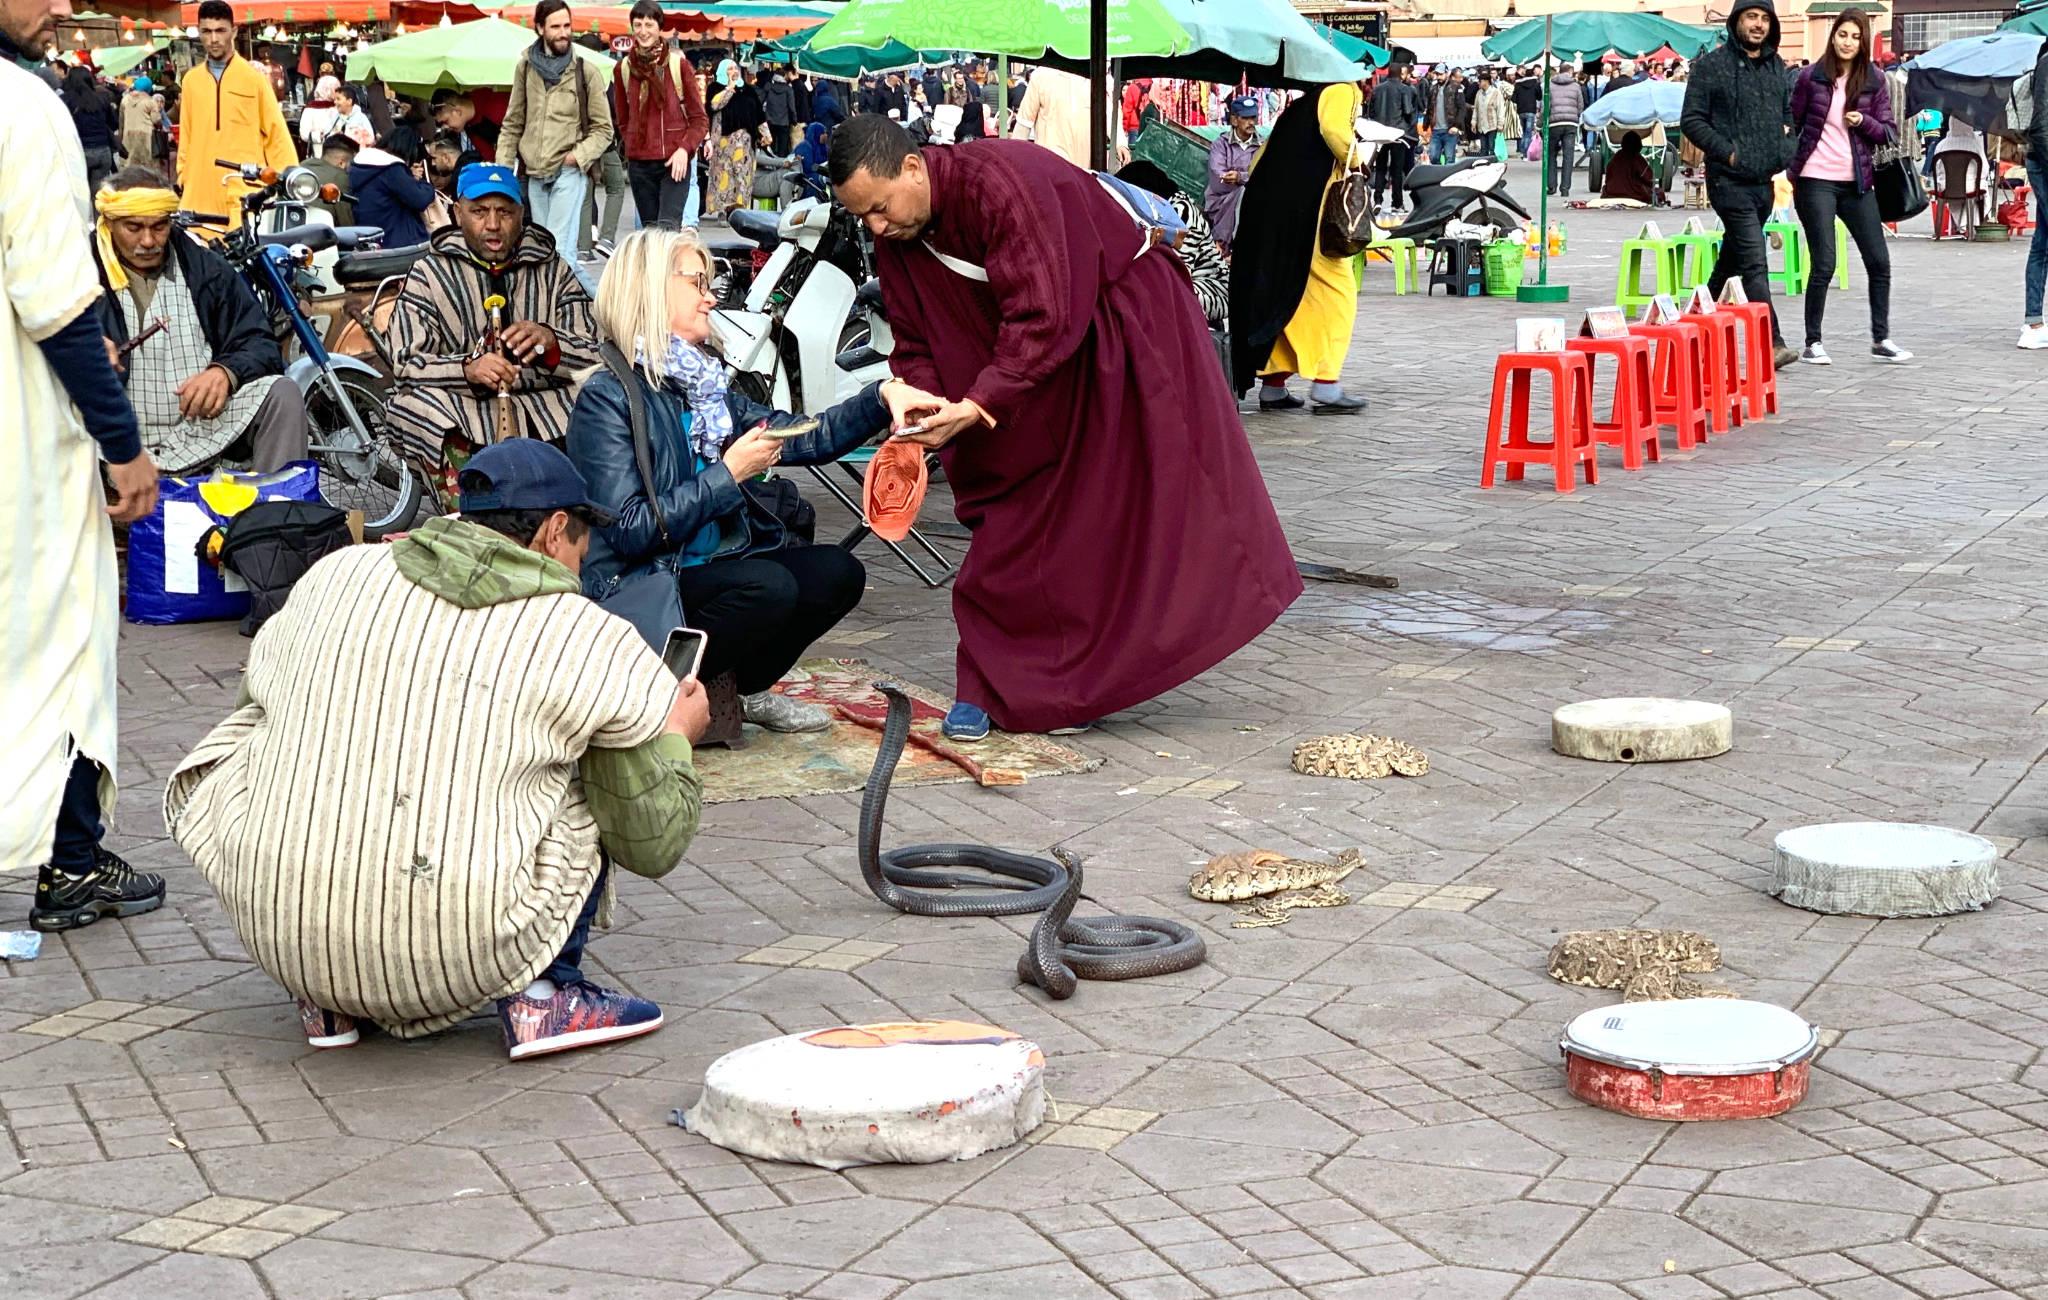 Charmeurs de serpents sur la place Jemaa El Fla